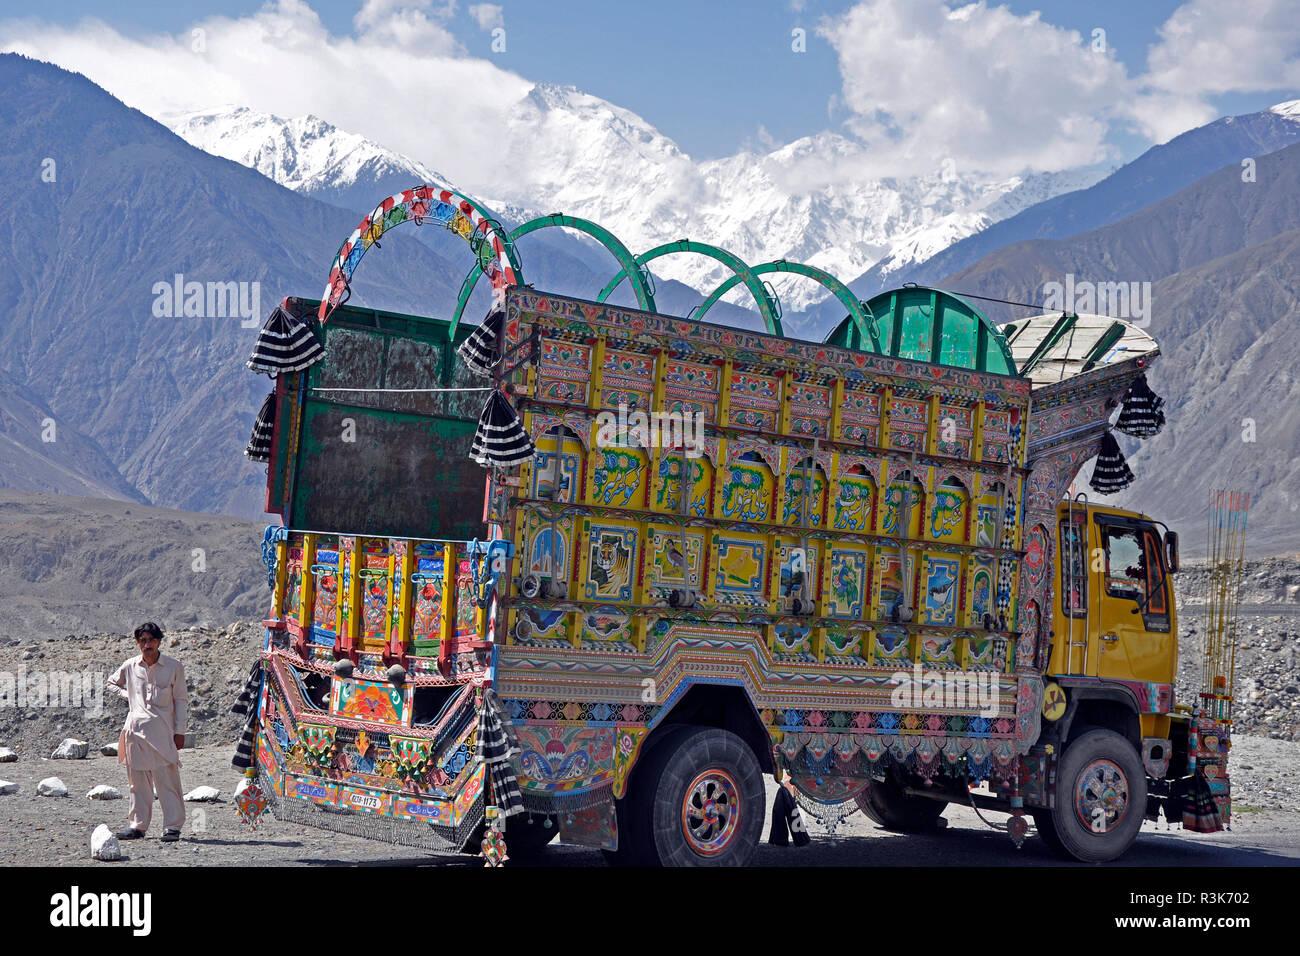 Pakistan, Karakorum highway, trucks - Stock Image